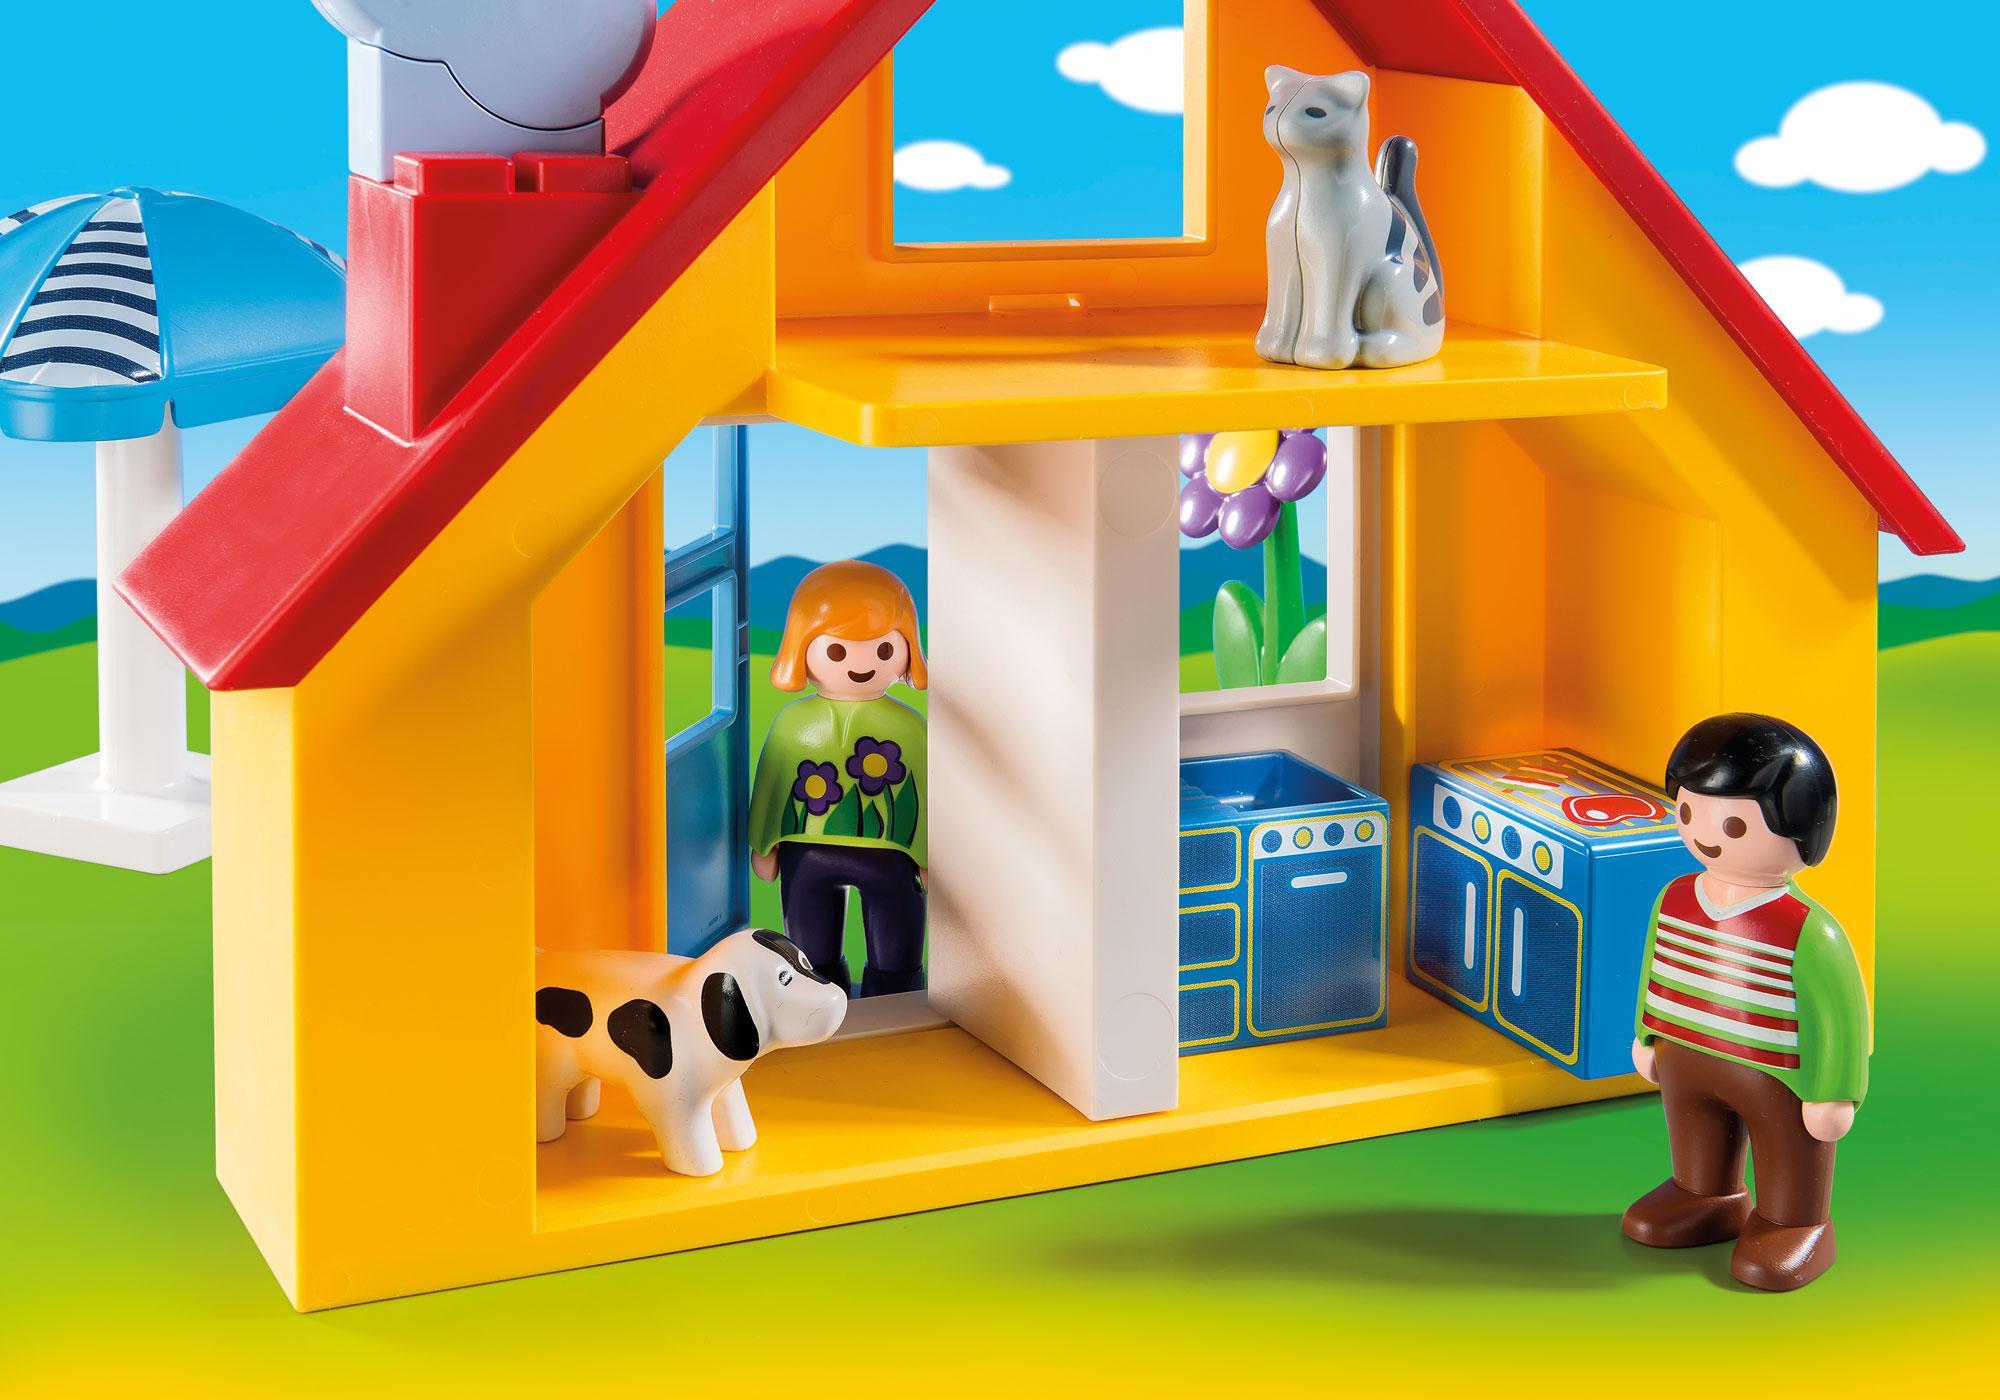 http://media.playmobil.com/i/playmobil/9527_product_extra1/1.2.3 Holiday Cottage